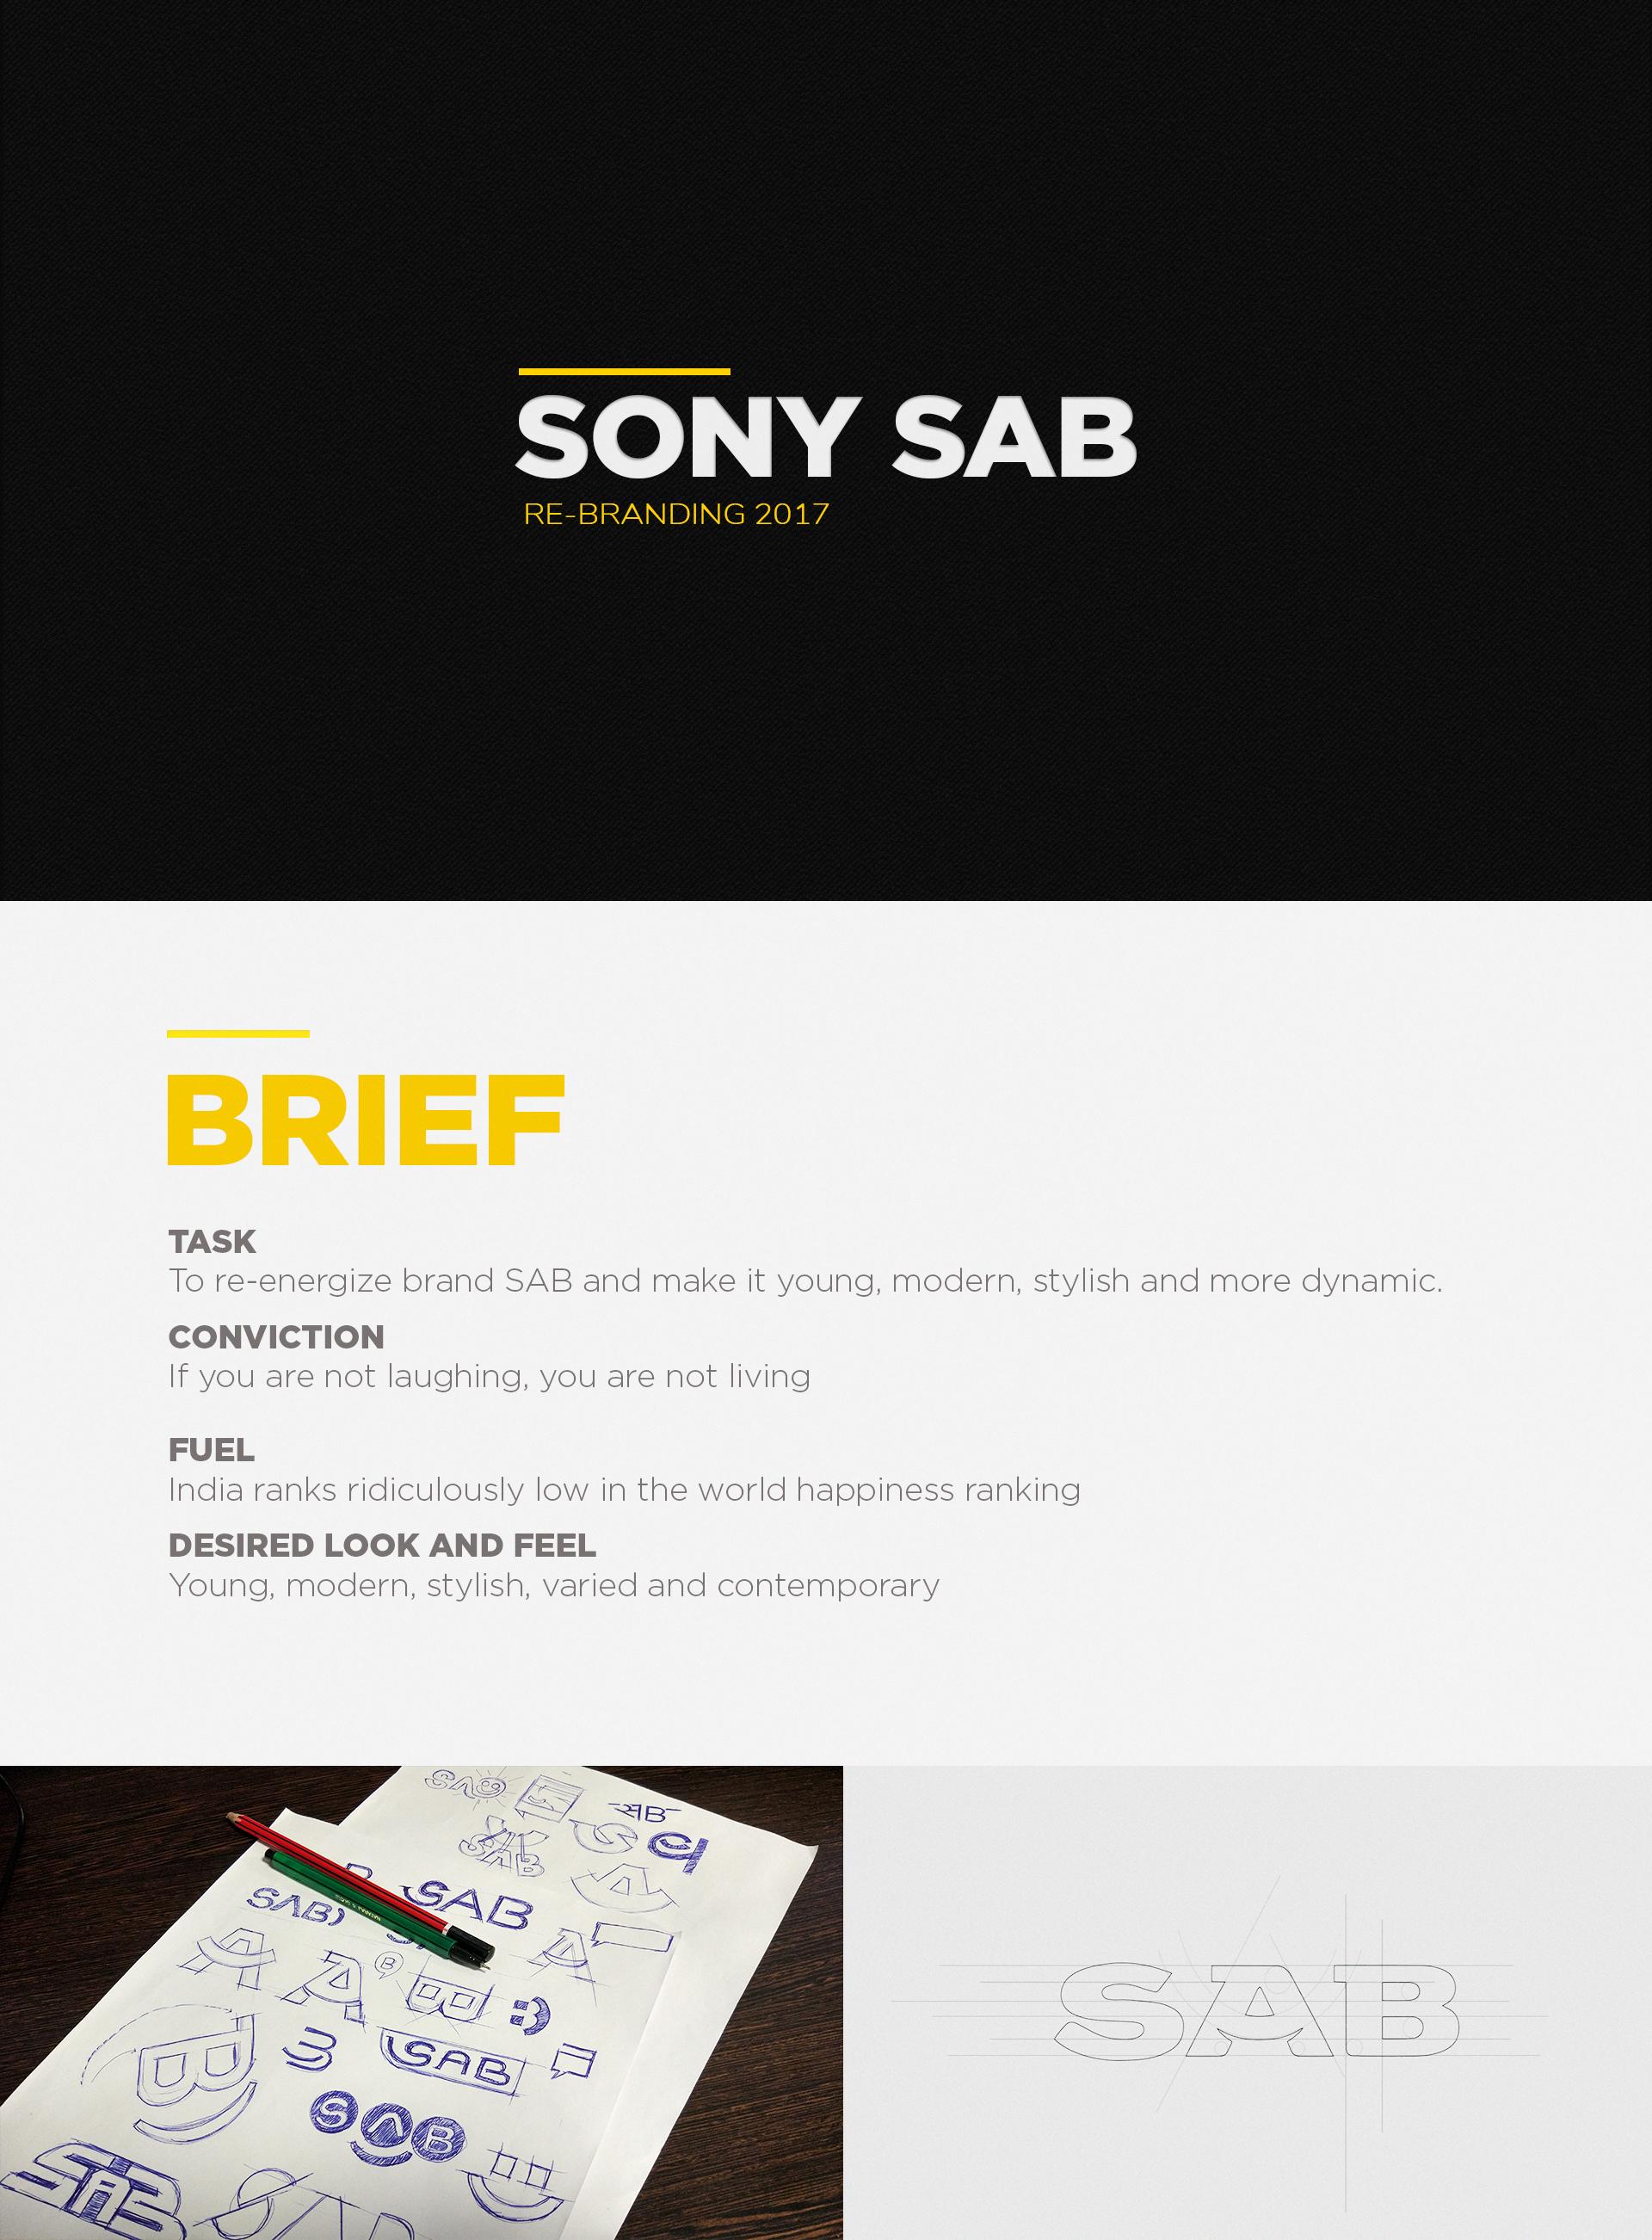 SONY SAB REBRANDING\'17 on Behance